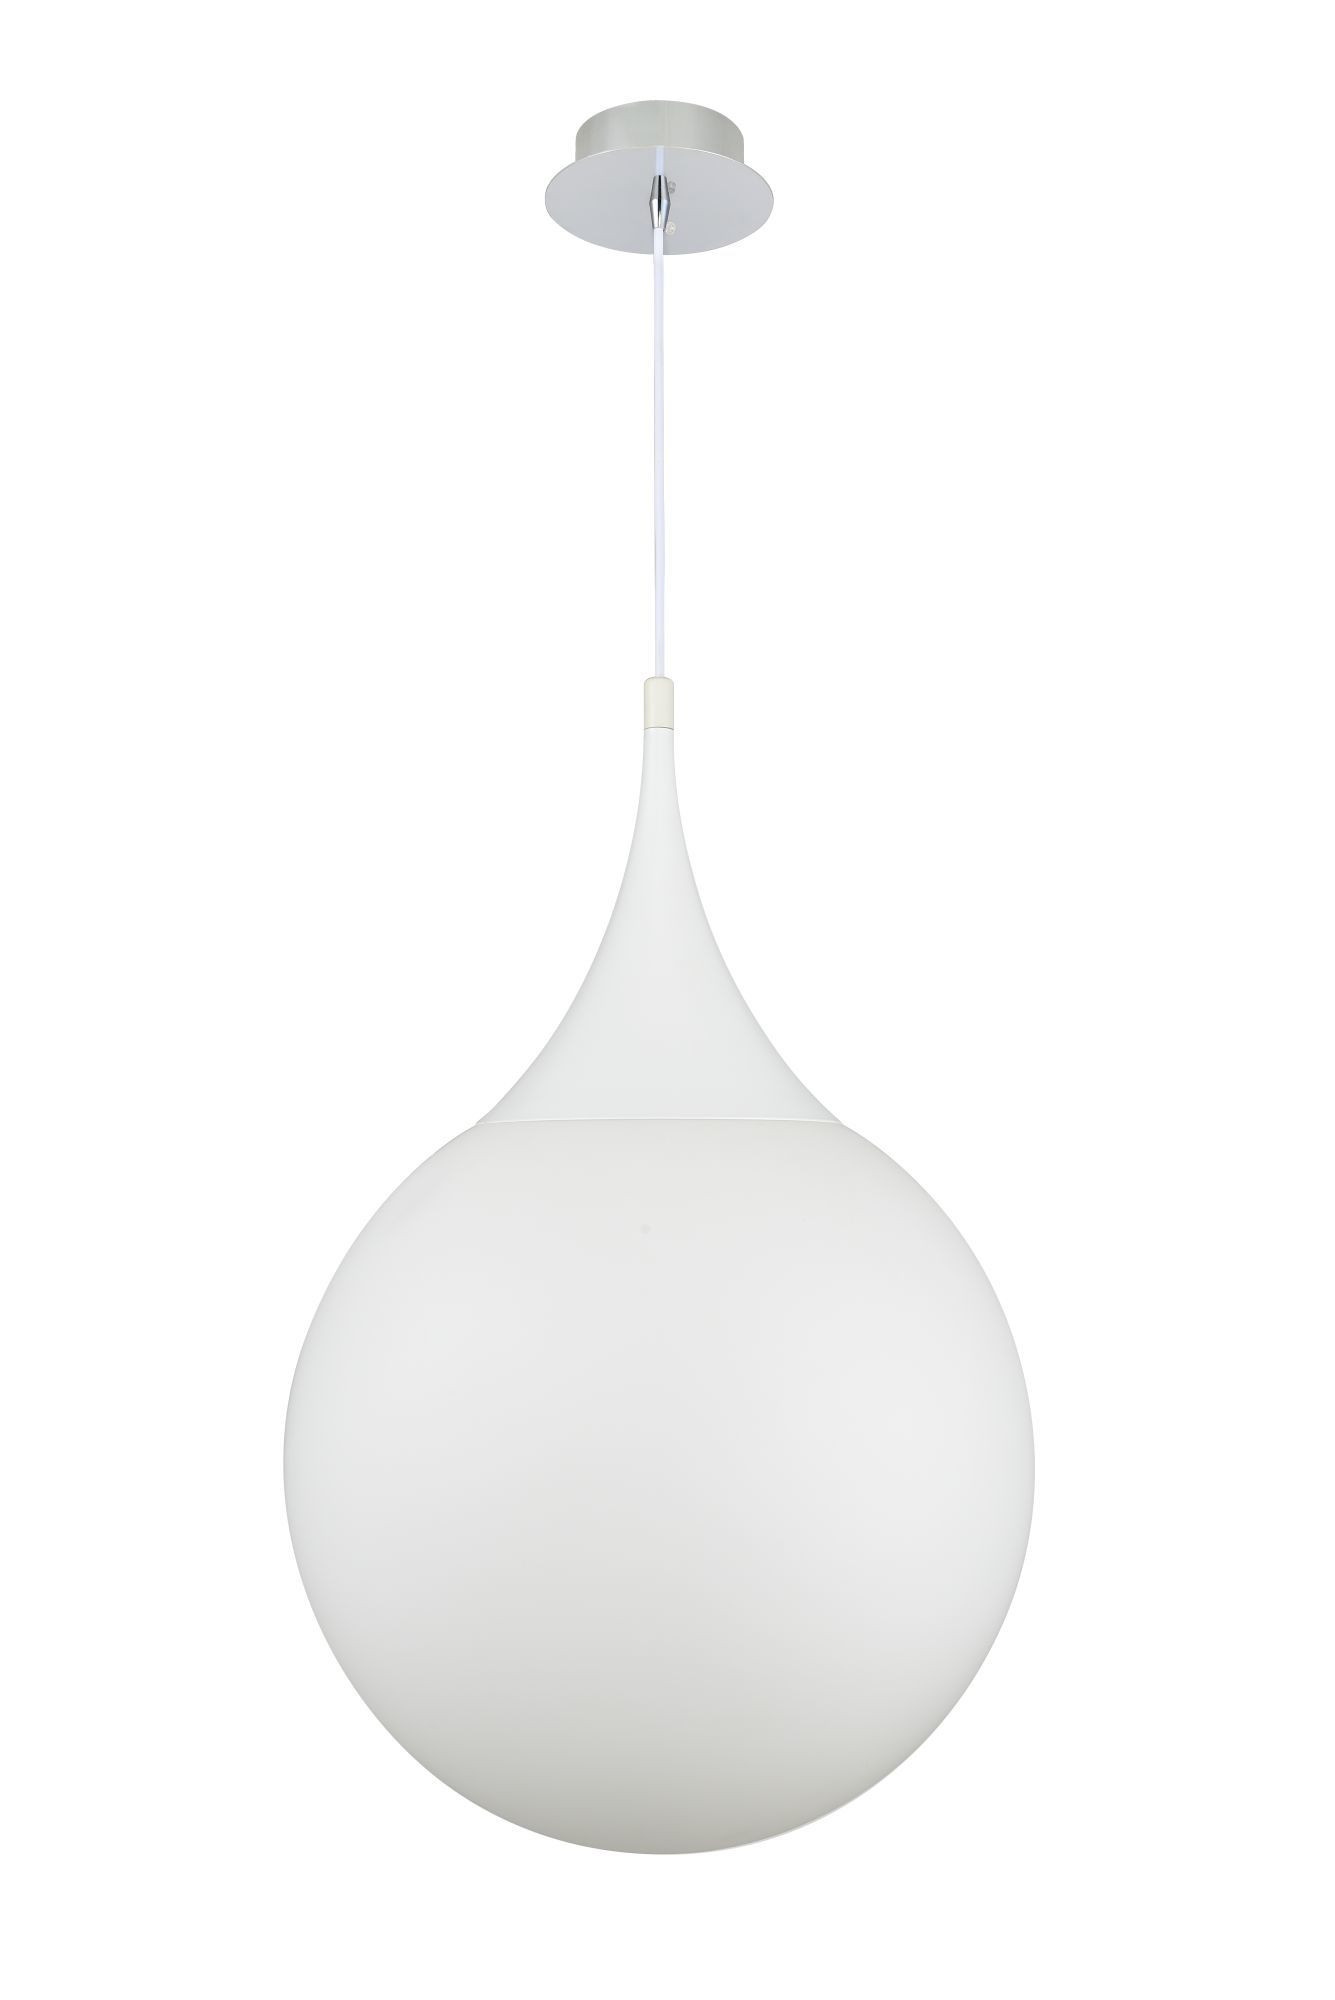 Подвесной светильник Maytoni Dewdrop P225-PL-400-N (mod225-40-n), 1xE27x8W, белый, металл, стекло - фото 2